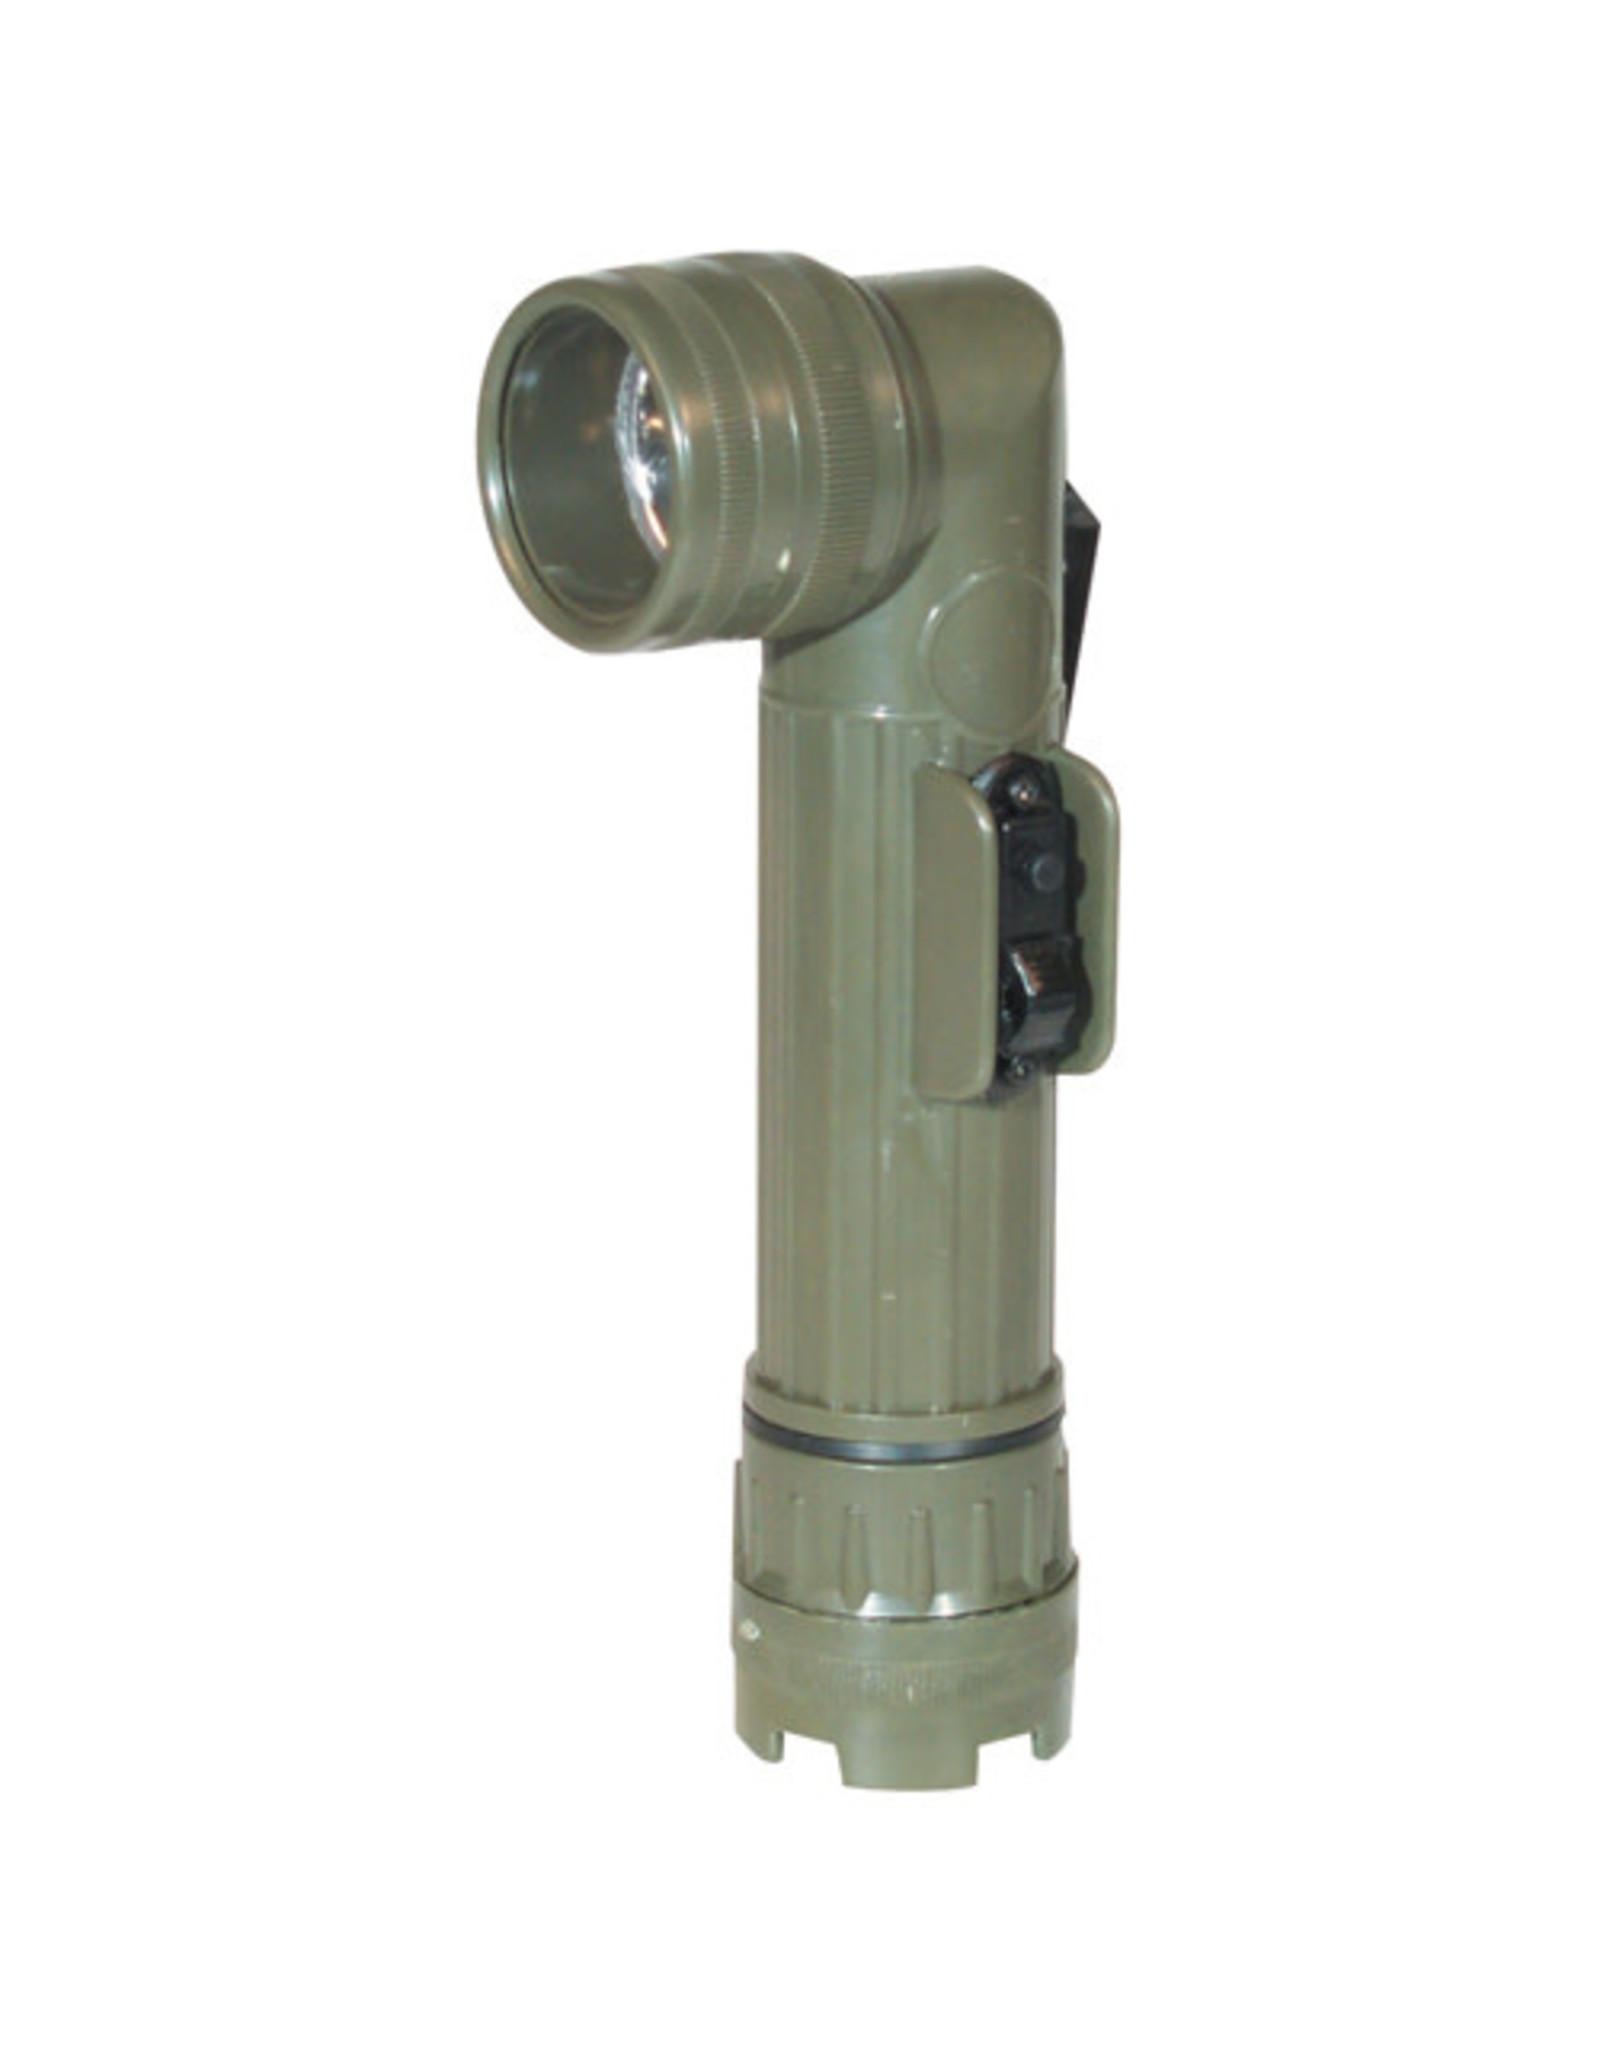 Analog Anglehead Flashlight